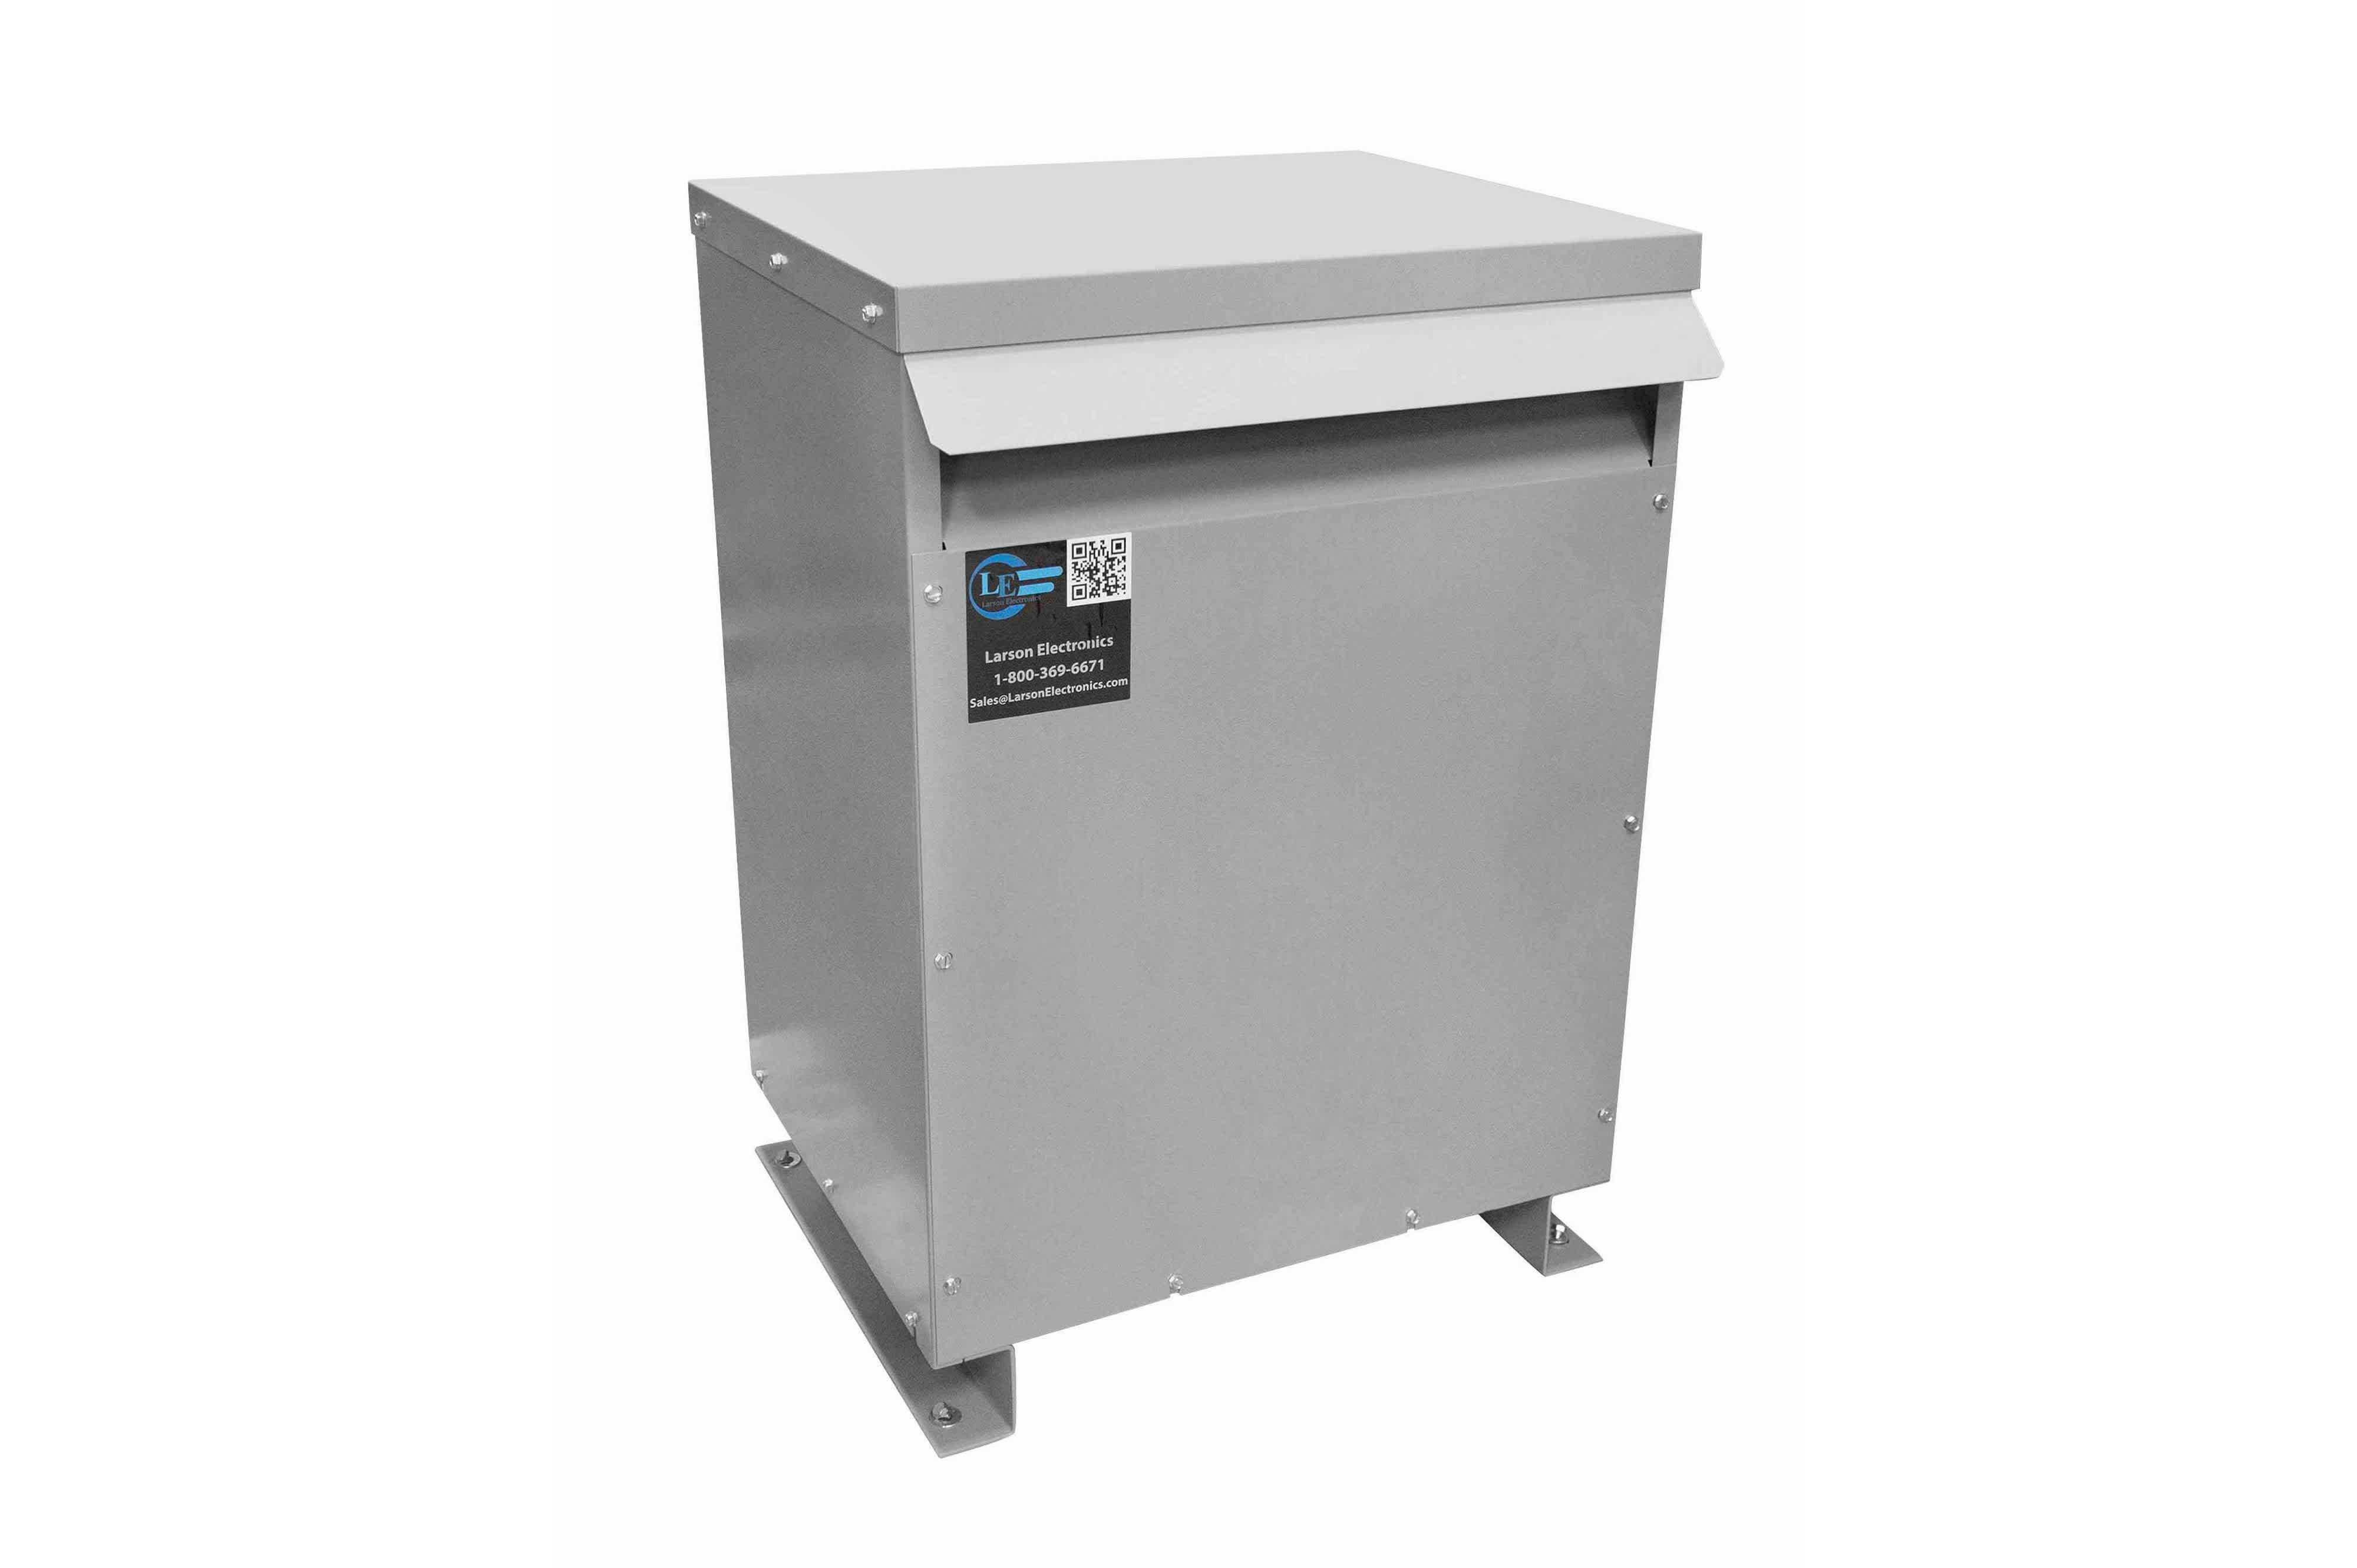 20 kVA 3PH Isolation Transformer, 380V Wye Primary, 240V/120 Delta Secondary, N3R, Ventilated, 60 Hz